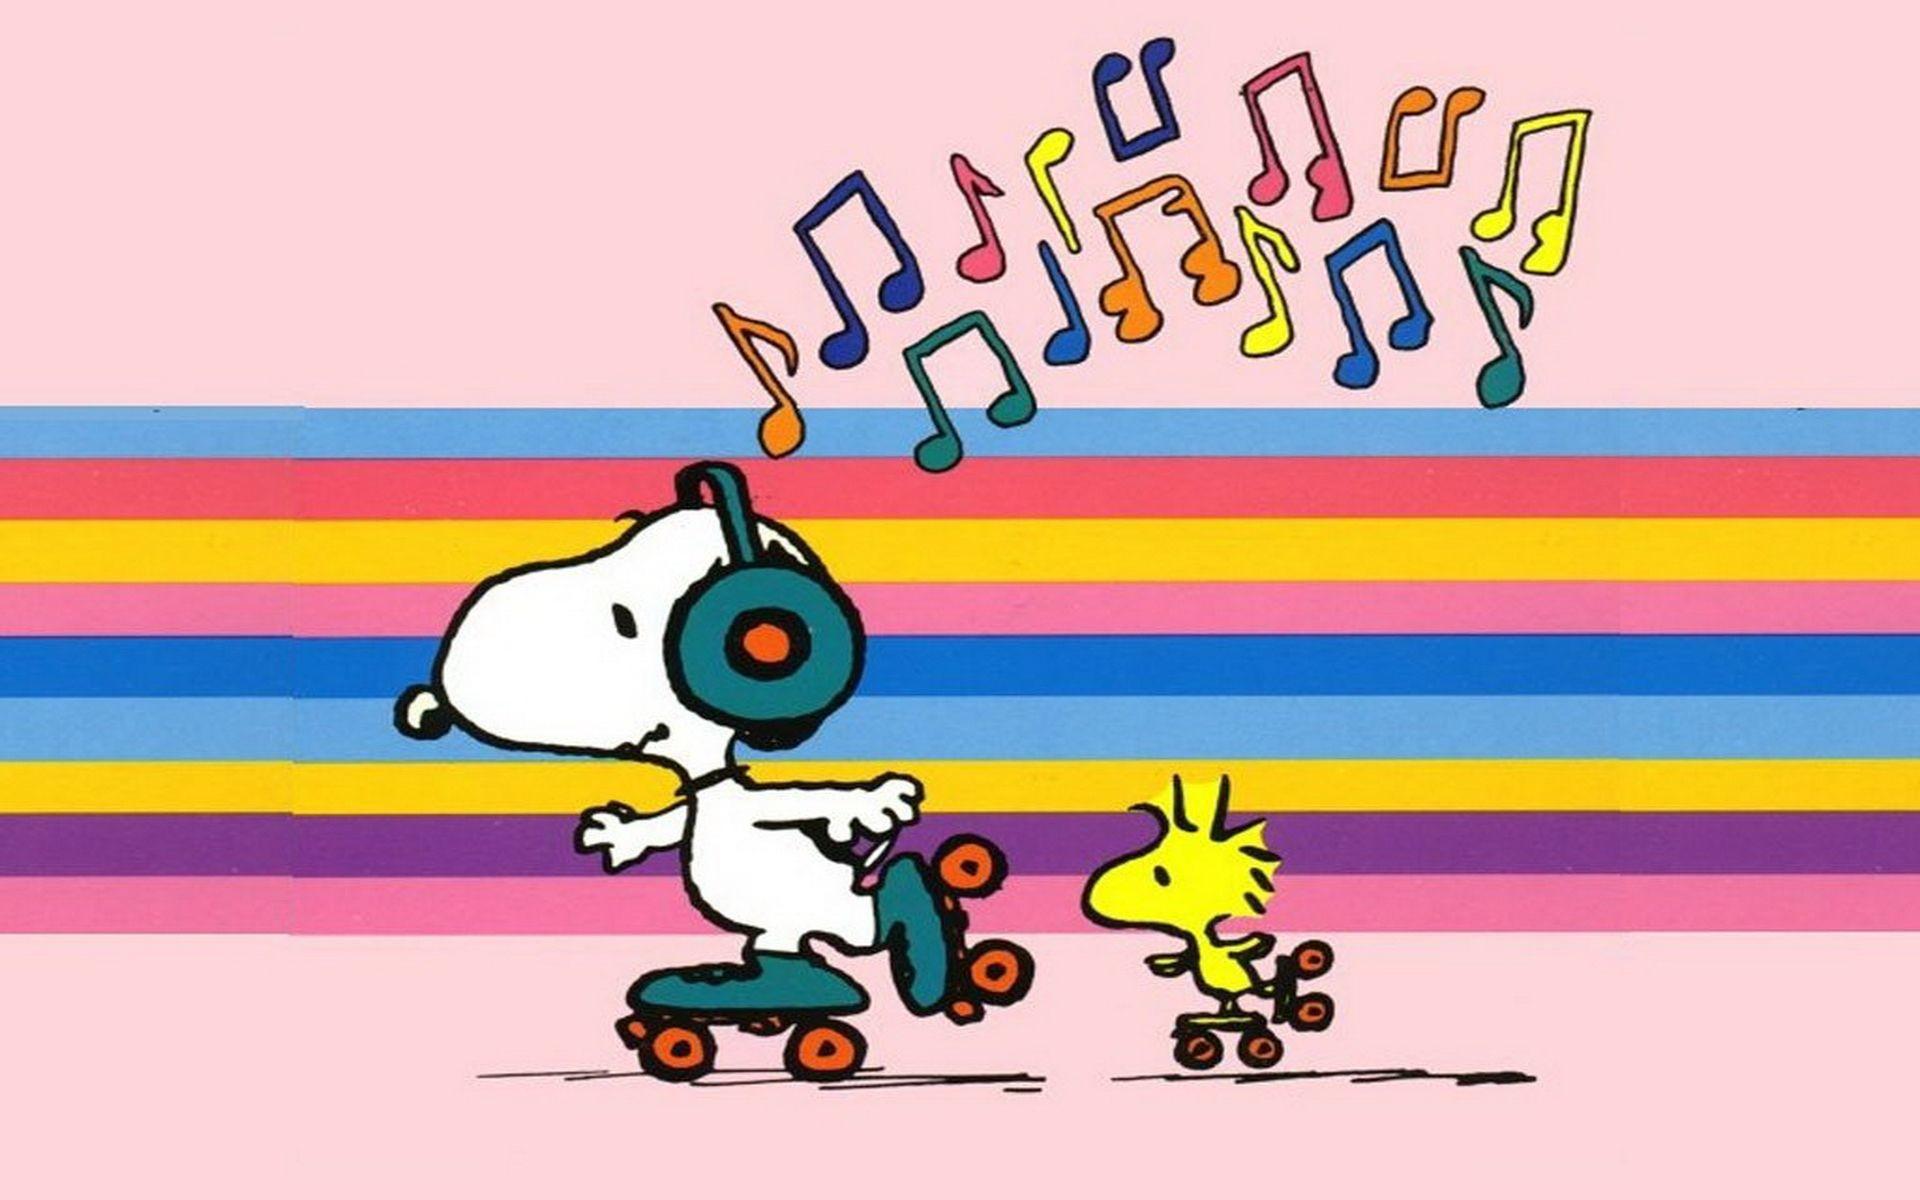 Snoopy wallpapers snoopy wallpaper 33 jpg – Snoopy Skating  Wallpaper. Download